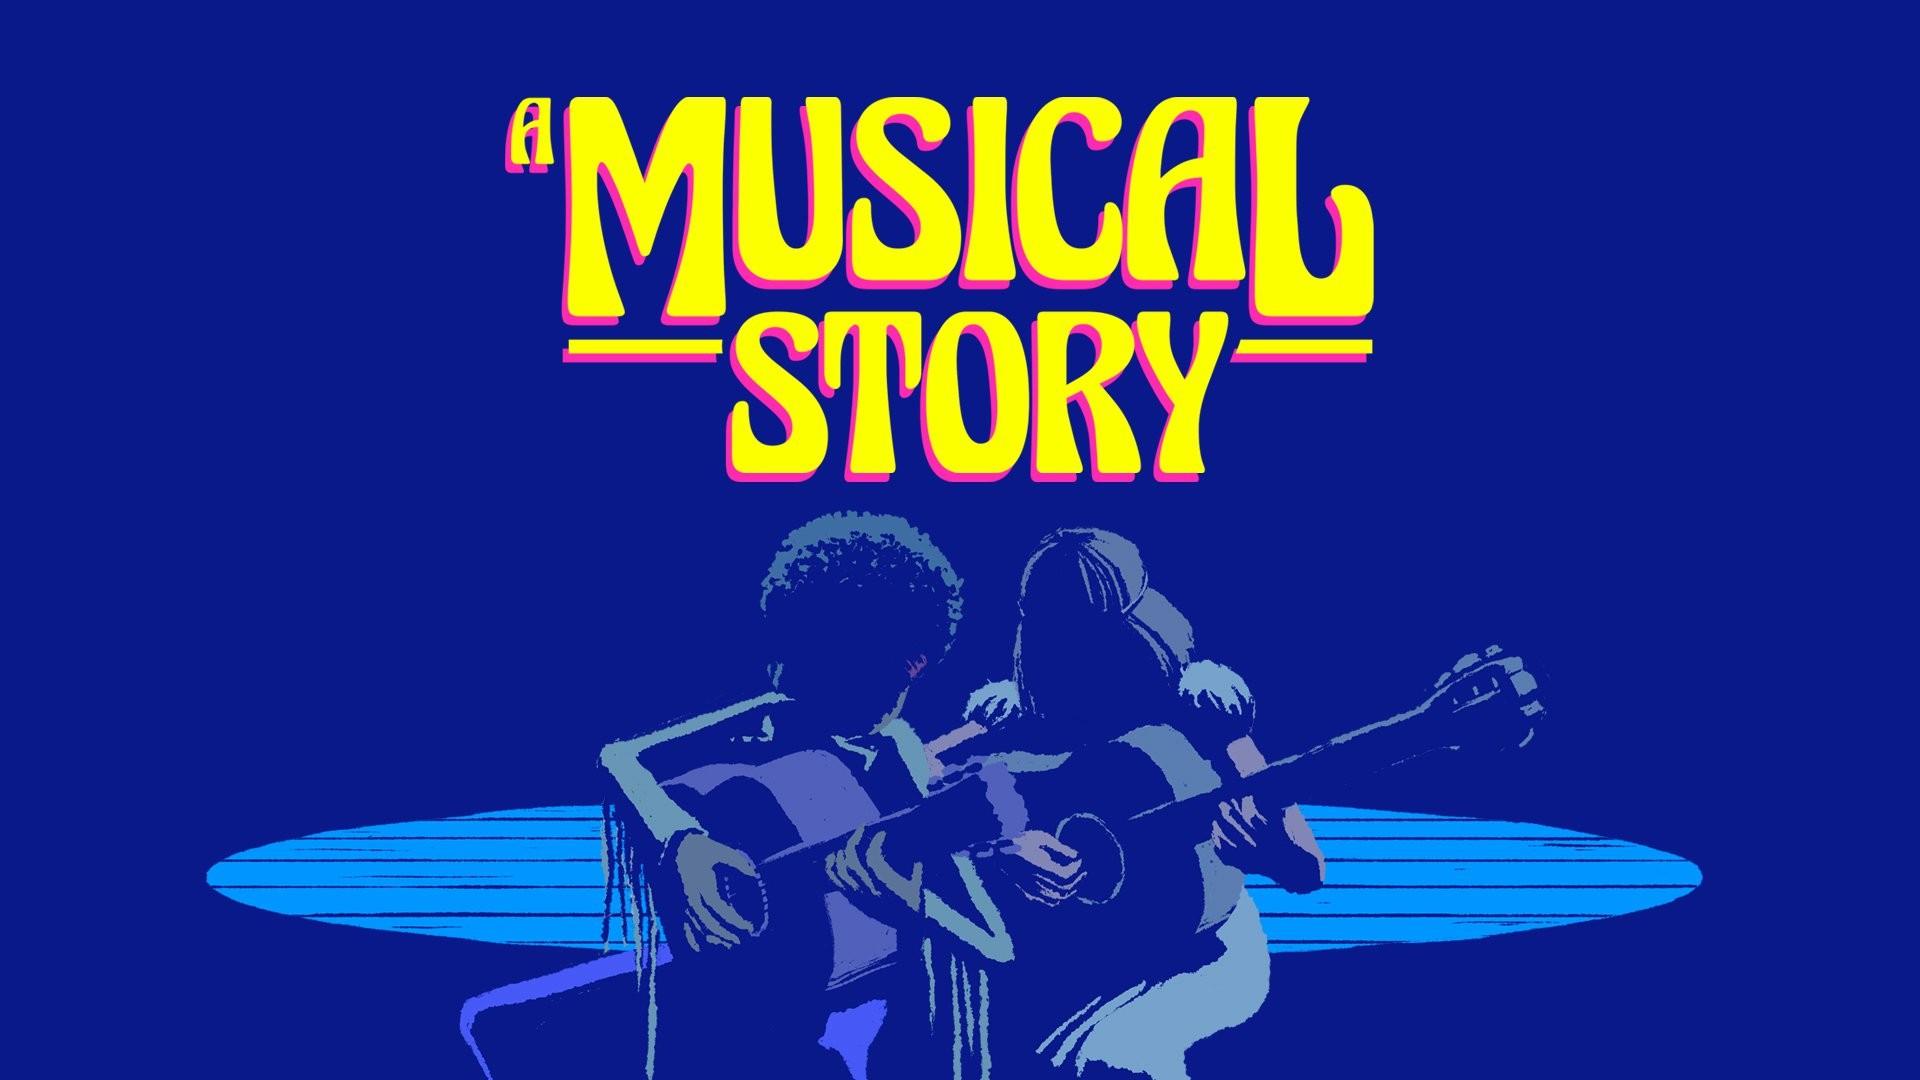 A-Musical-Story-NintendOn